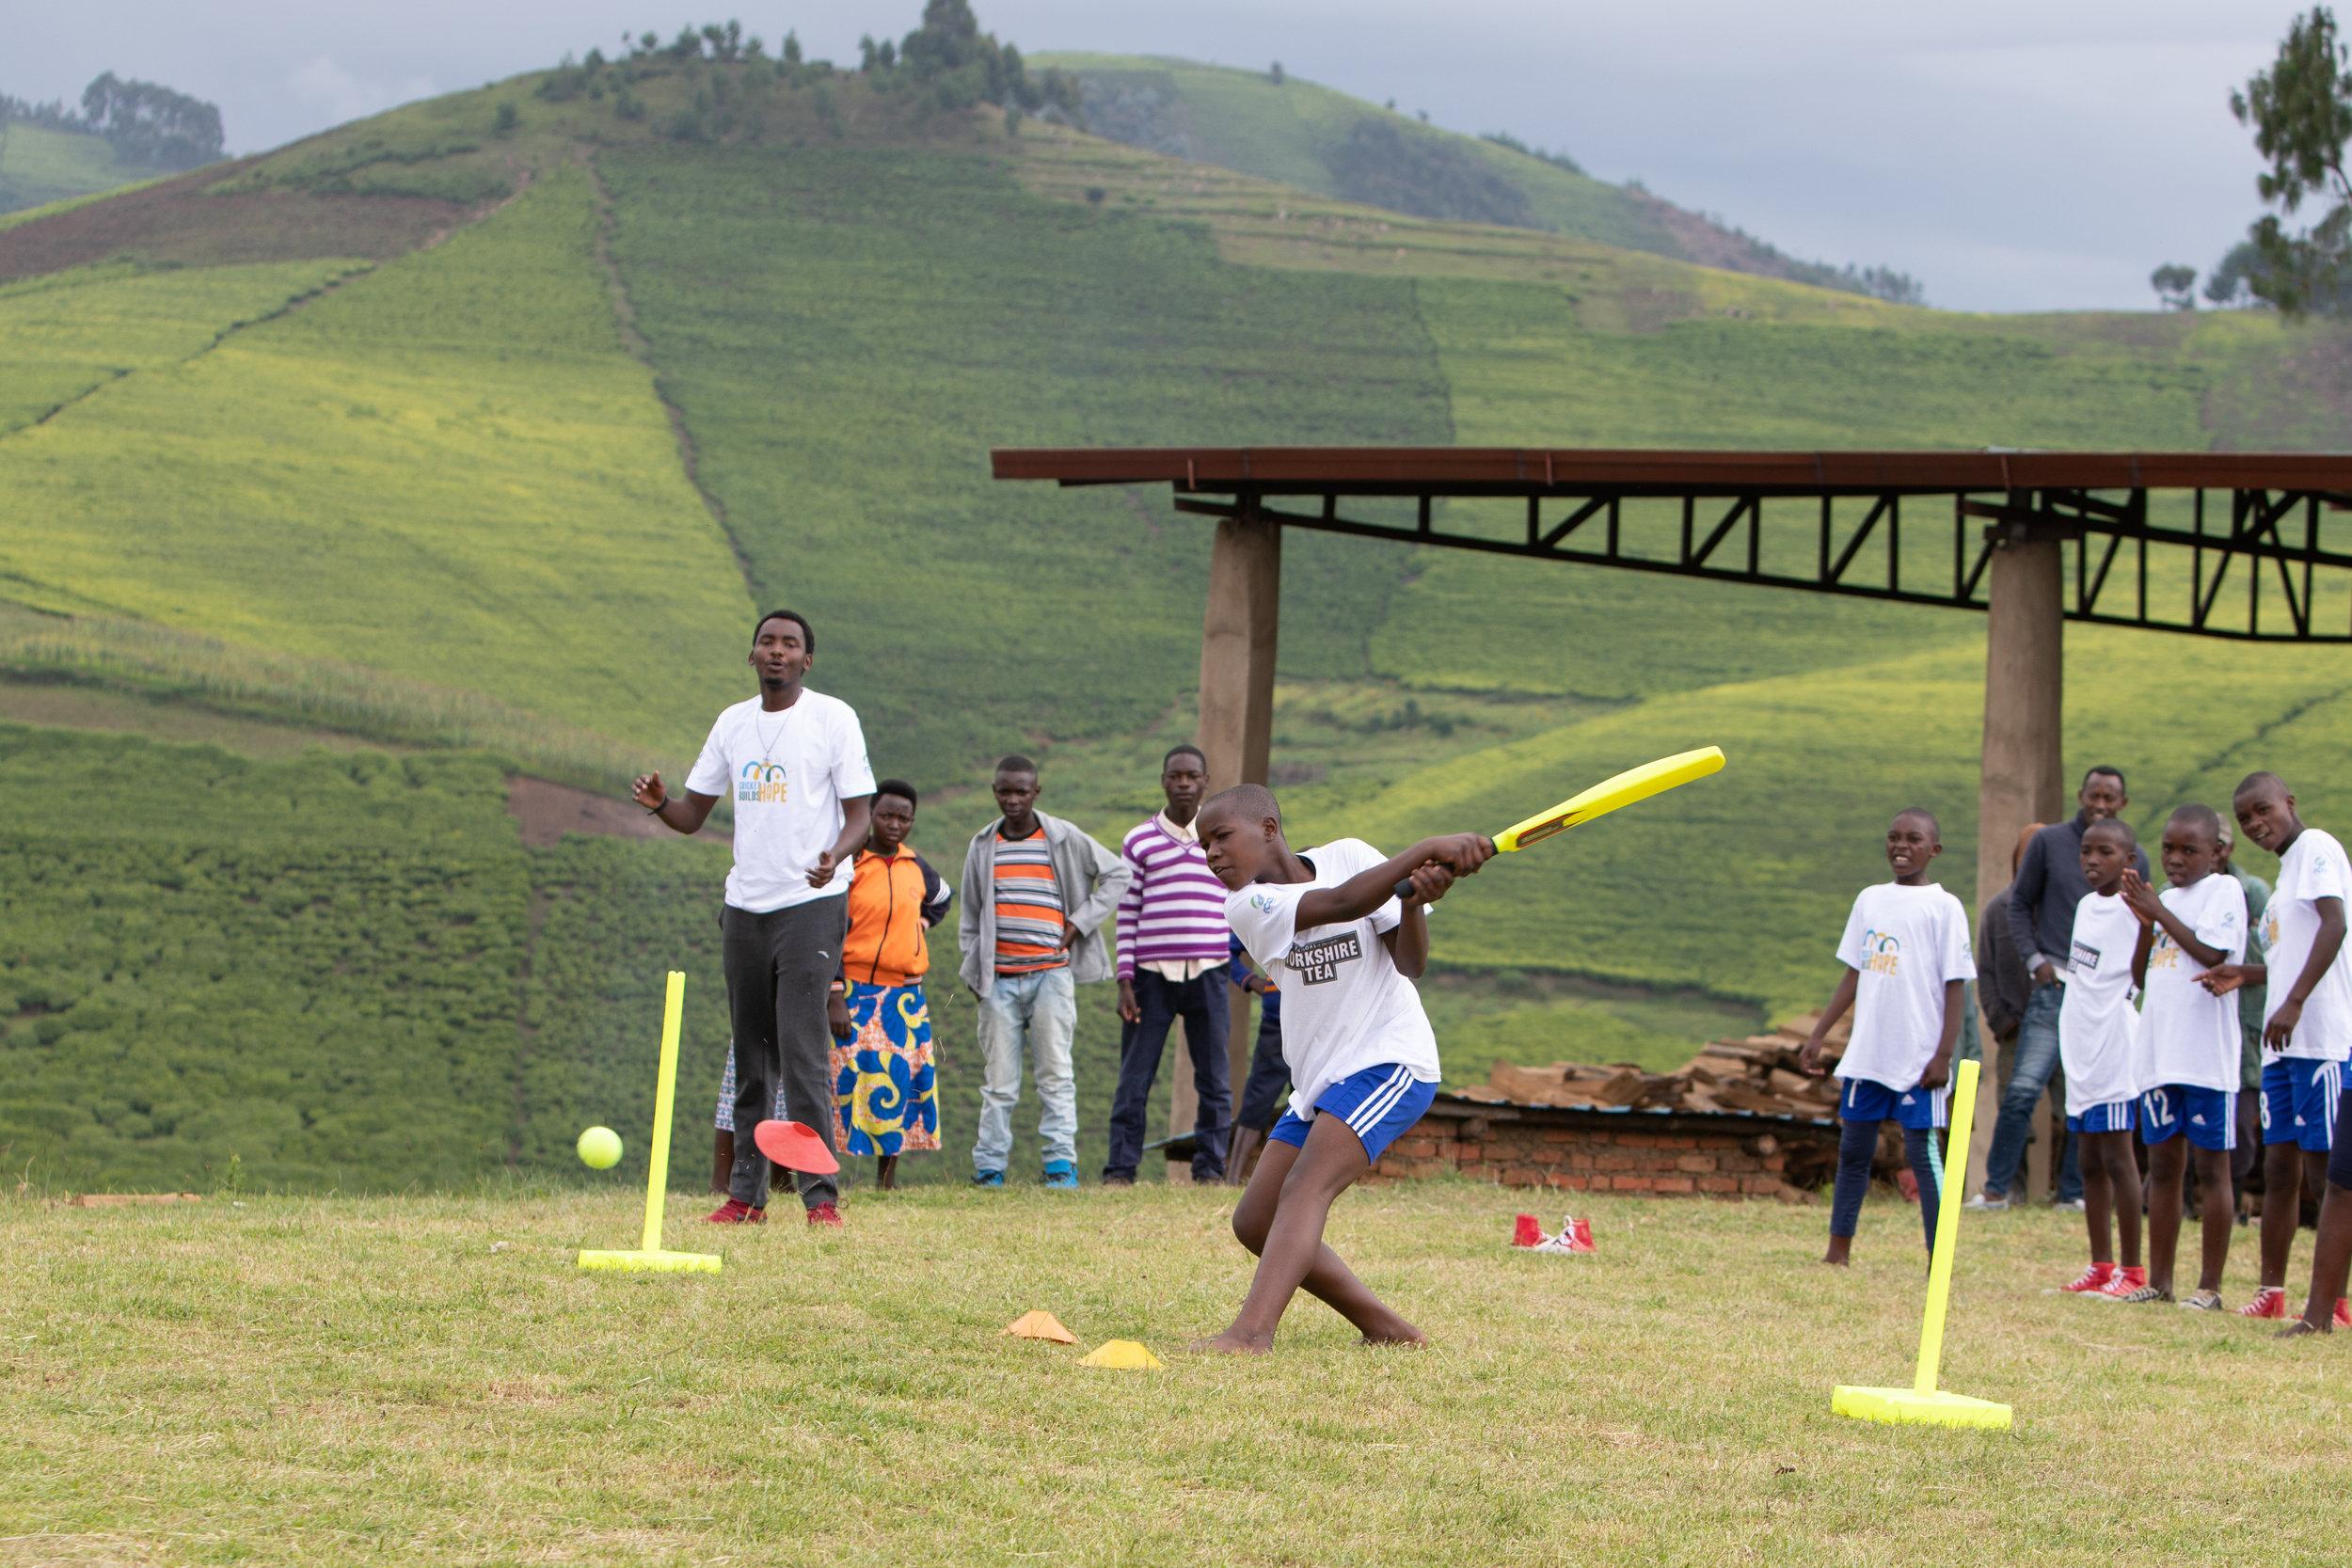 YorkshireTea_Rwanda2019-9.jpg